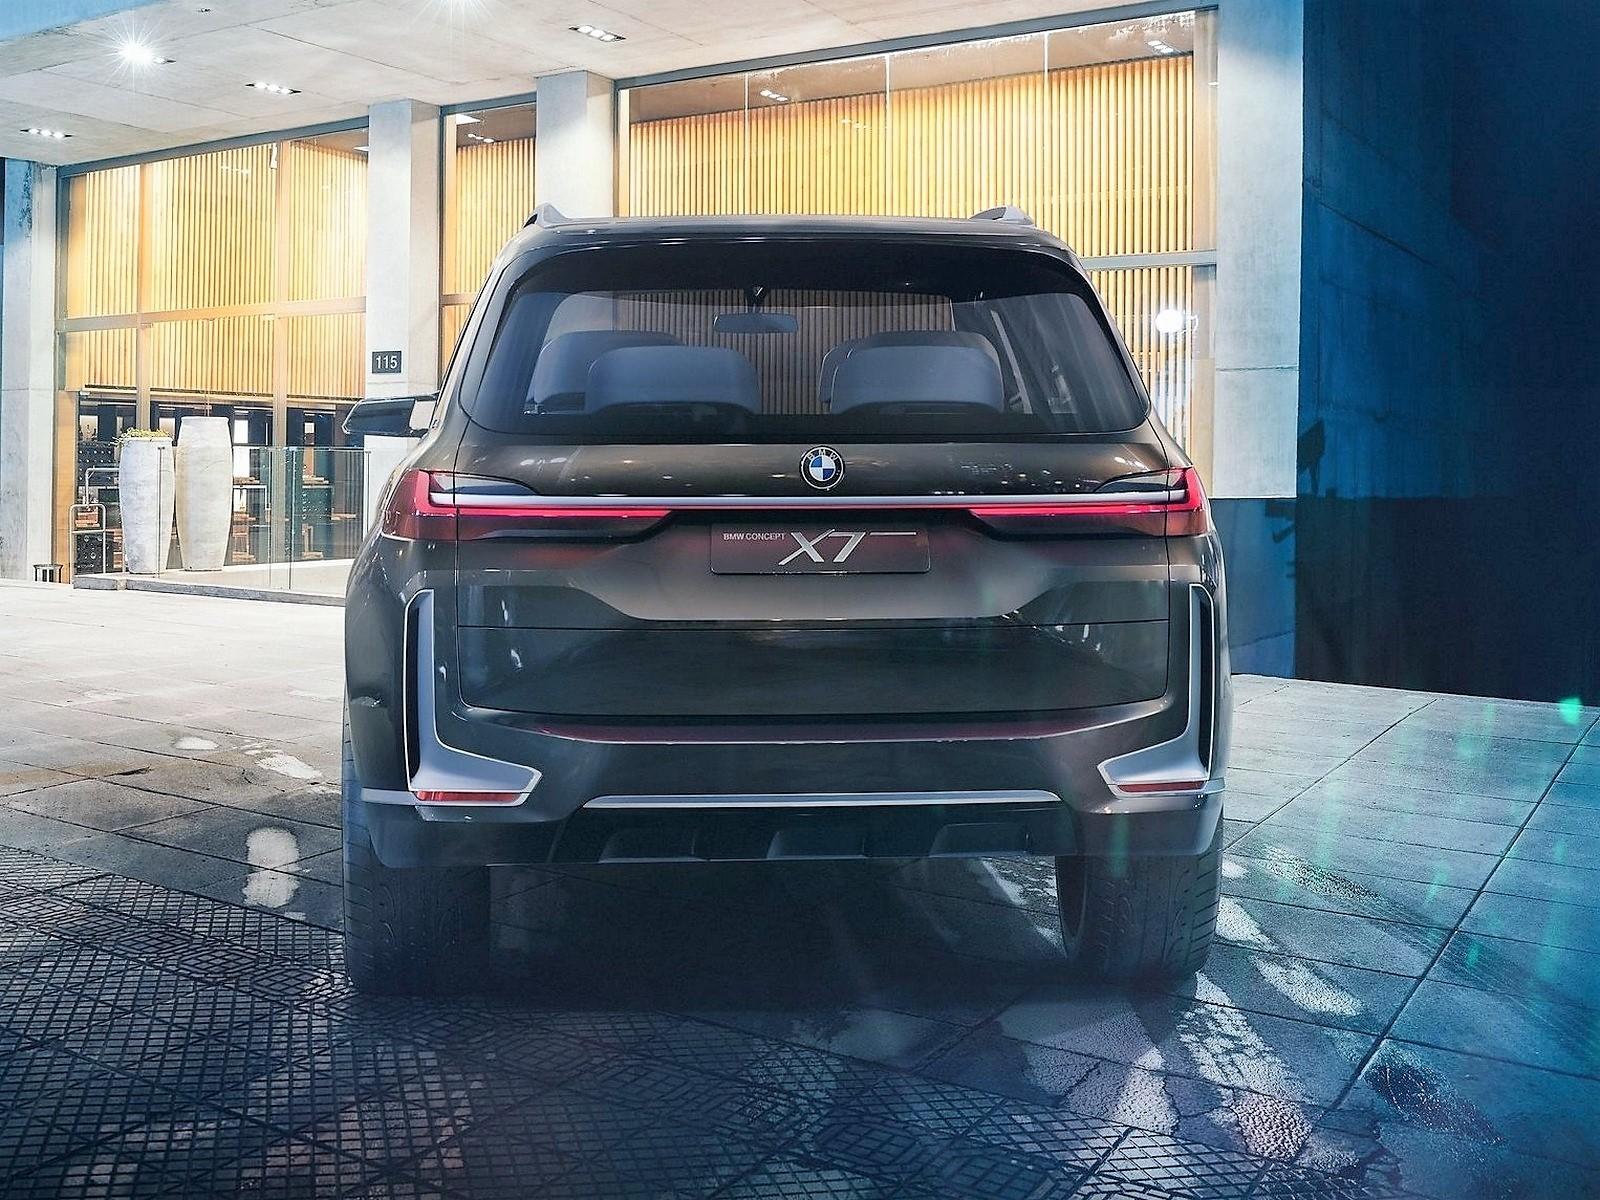 BMW X7 iPerformance Concept 2017